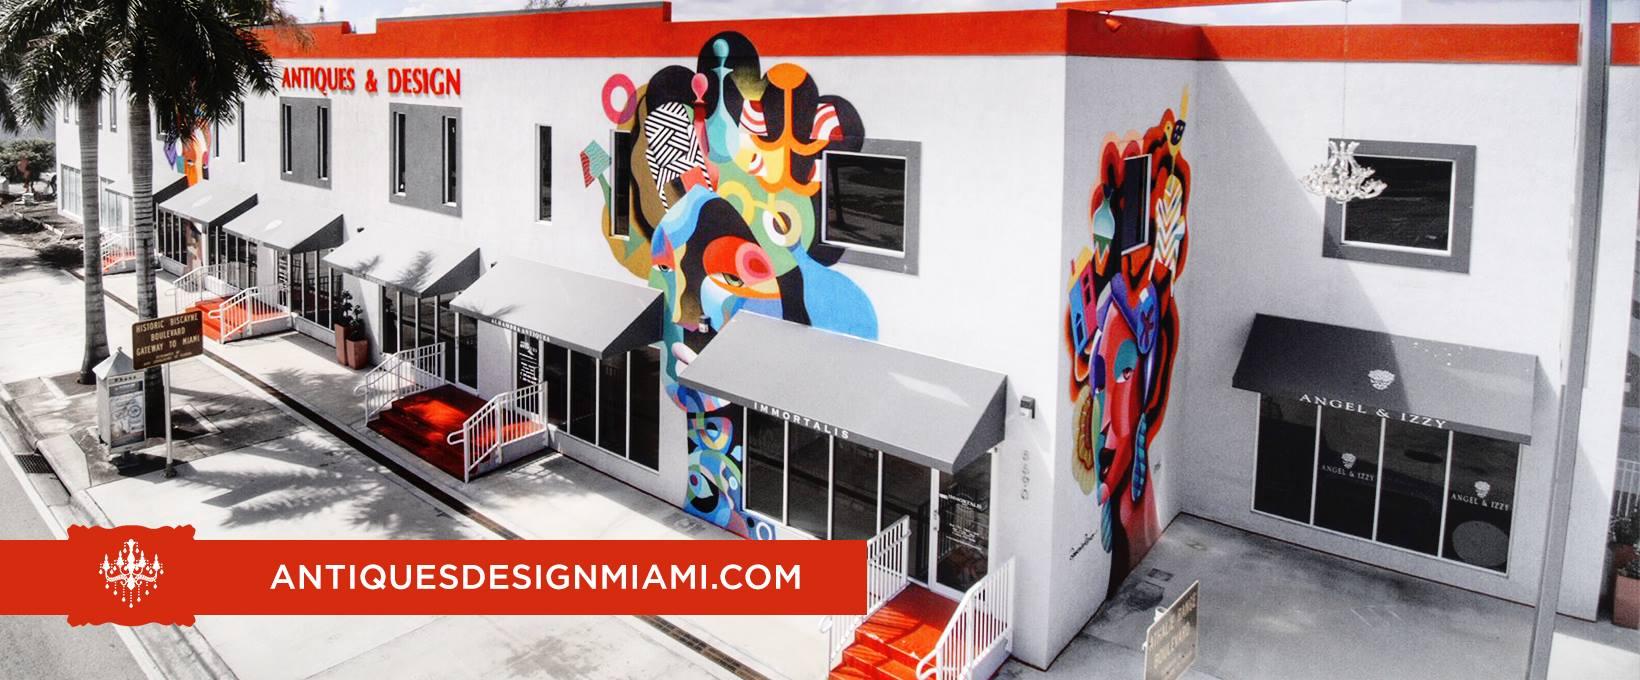 Antiques & Design Mall